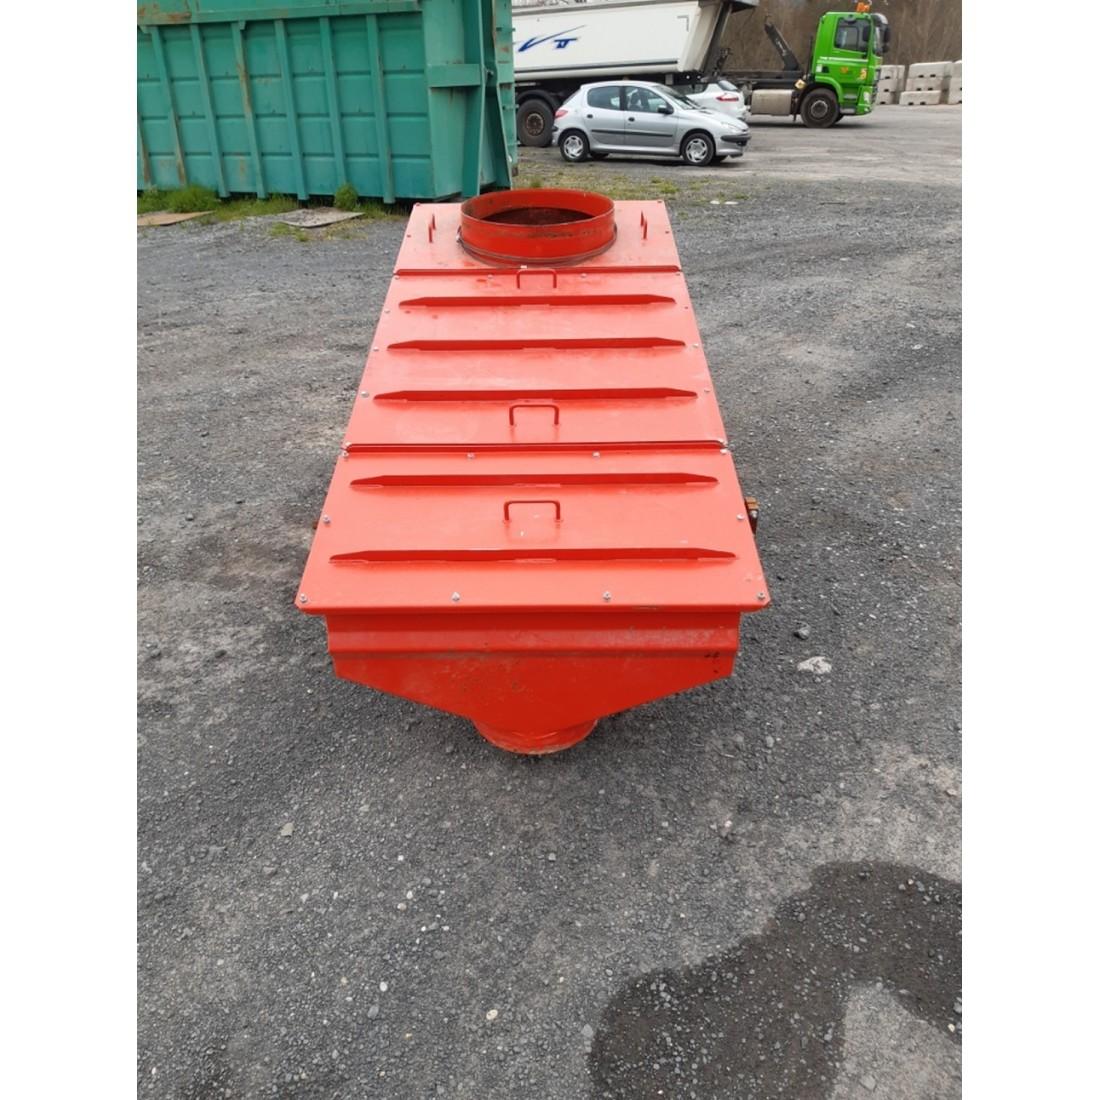 R4U81 Mild steel SINEX Corridor / Vibratinf feeder - Visbile by appointment